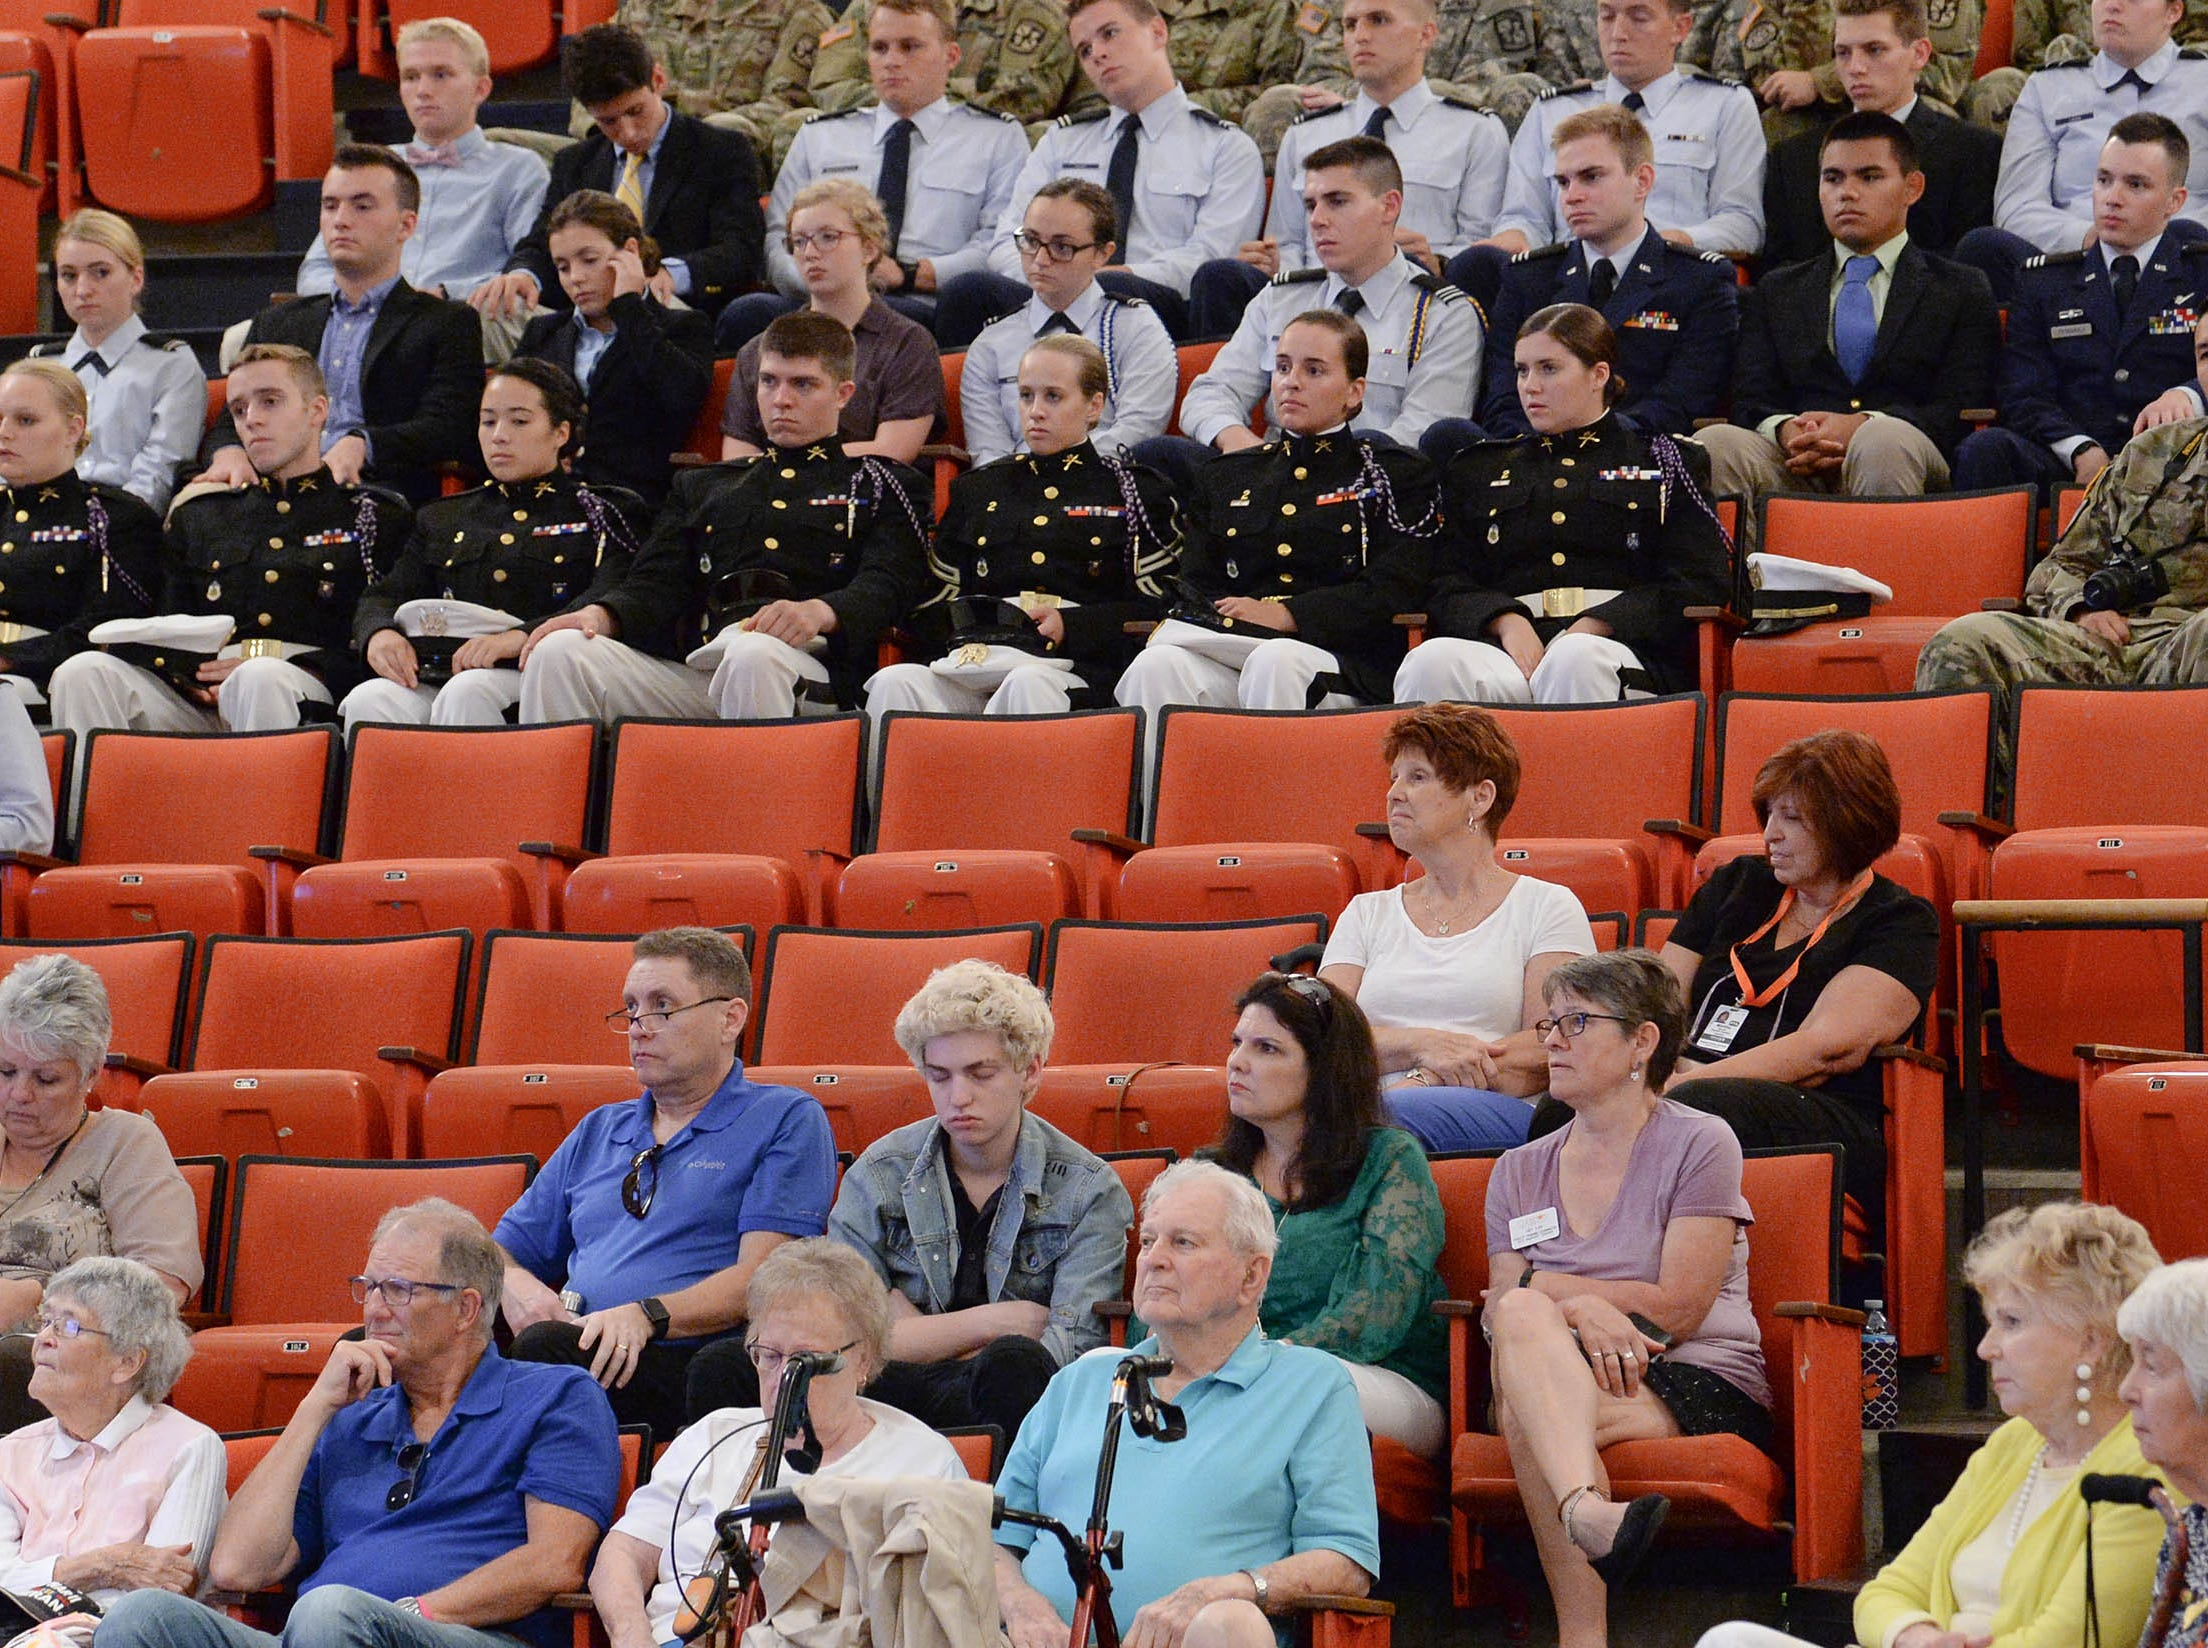 Clemson University ROTC listen to three Living Prisoners of War in Tillman Hall at Clemson University  on Thursday.  Col. Ben Skardon, 1st Lt. Bill Funchess, and Col. Bill Austin spoke.